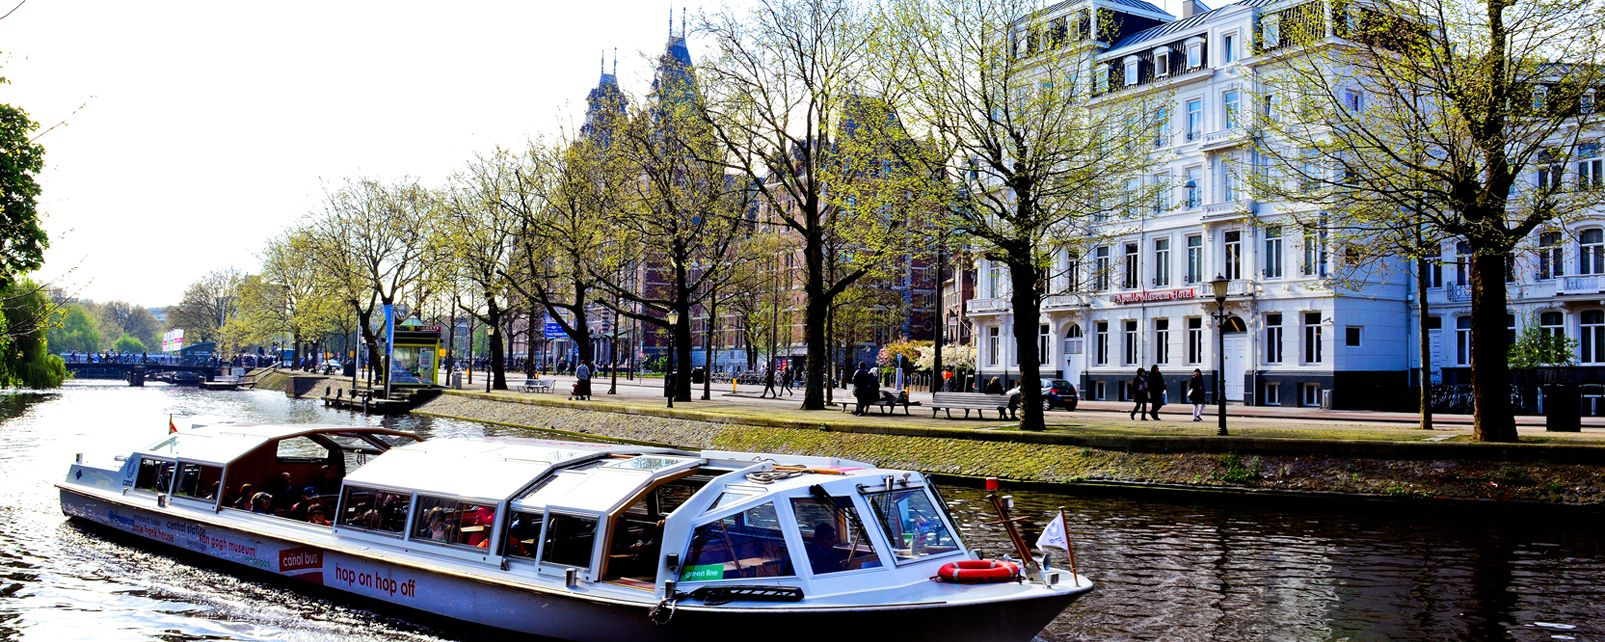 Hotel Best Western Apollo Museumhotel Amsterdam